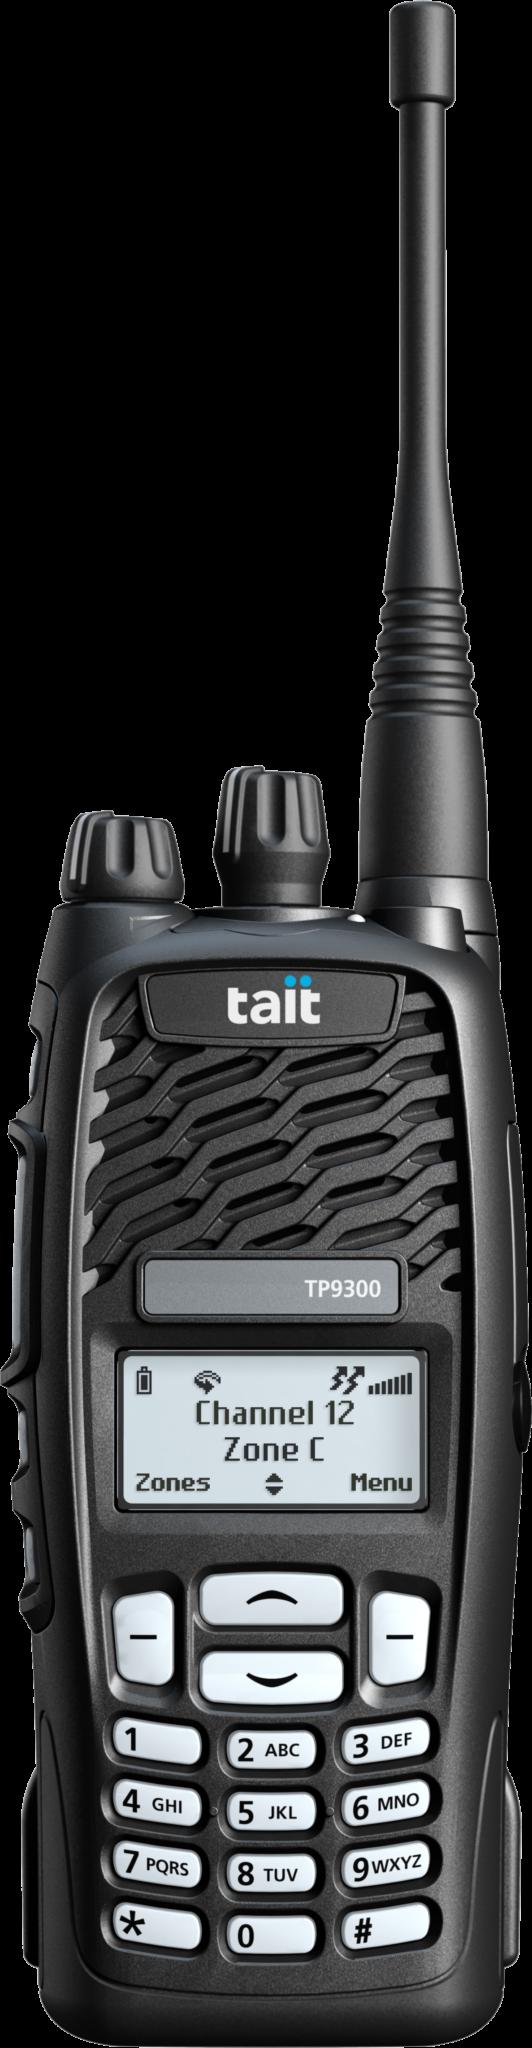 Tait TP9360 Handfunkgerät mit 16-Tasten Bedienfeld